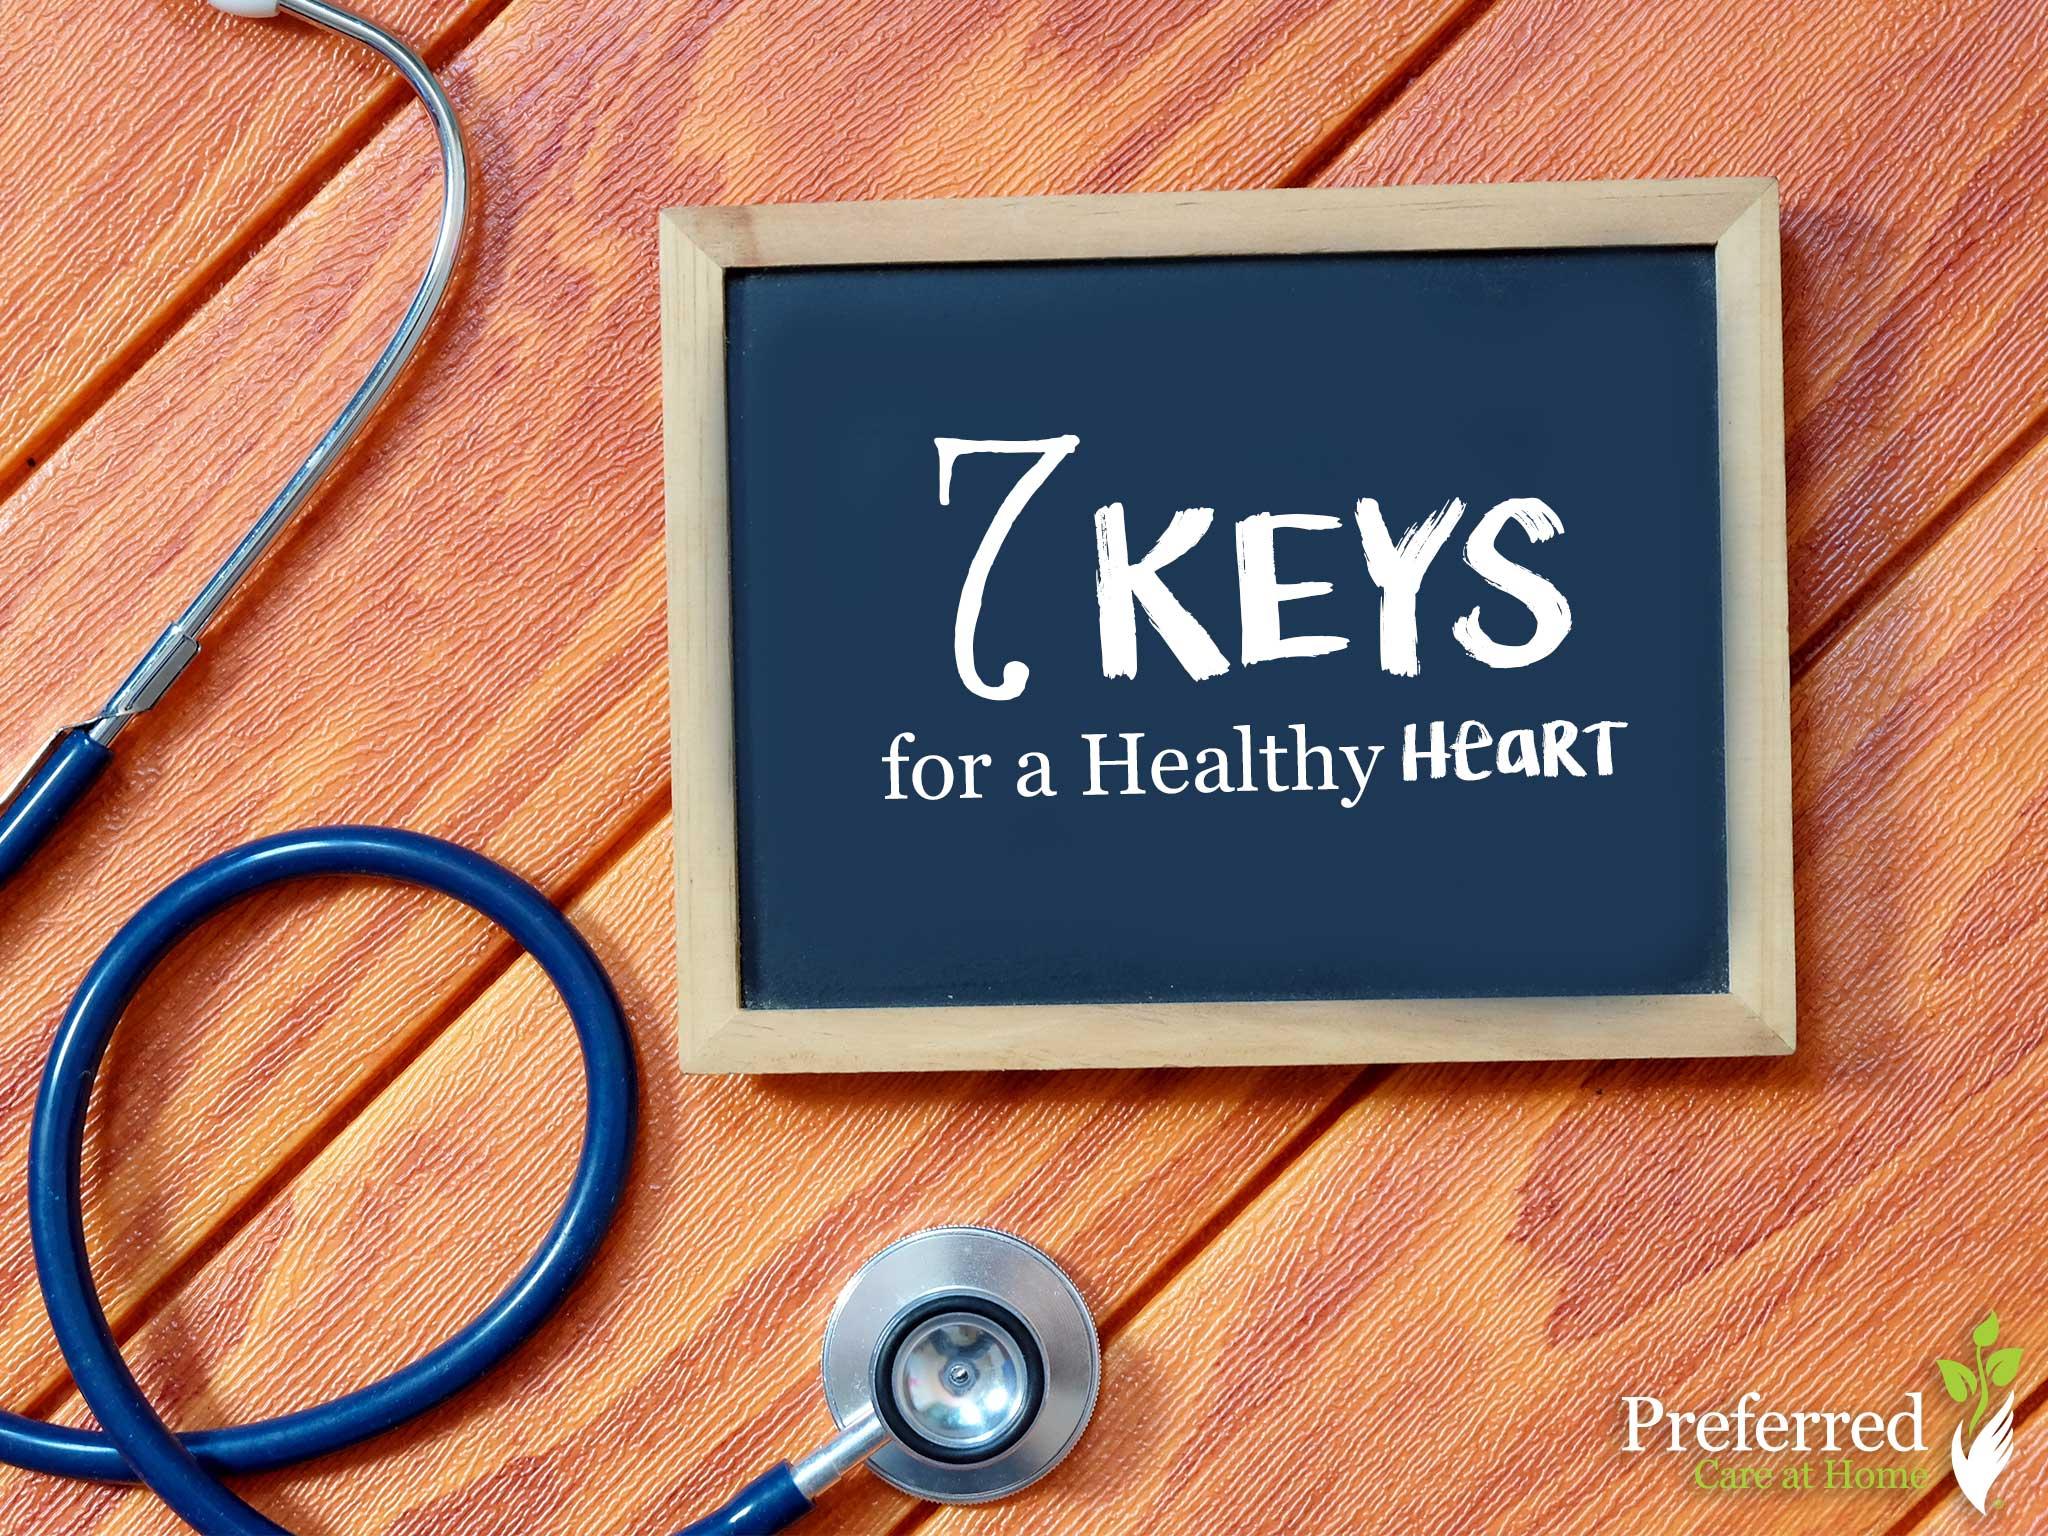 Combatting Heart Disease: 7 Keys to a Healthy Heart